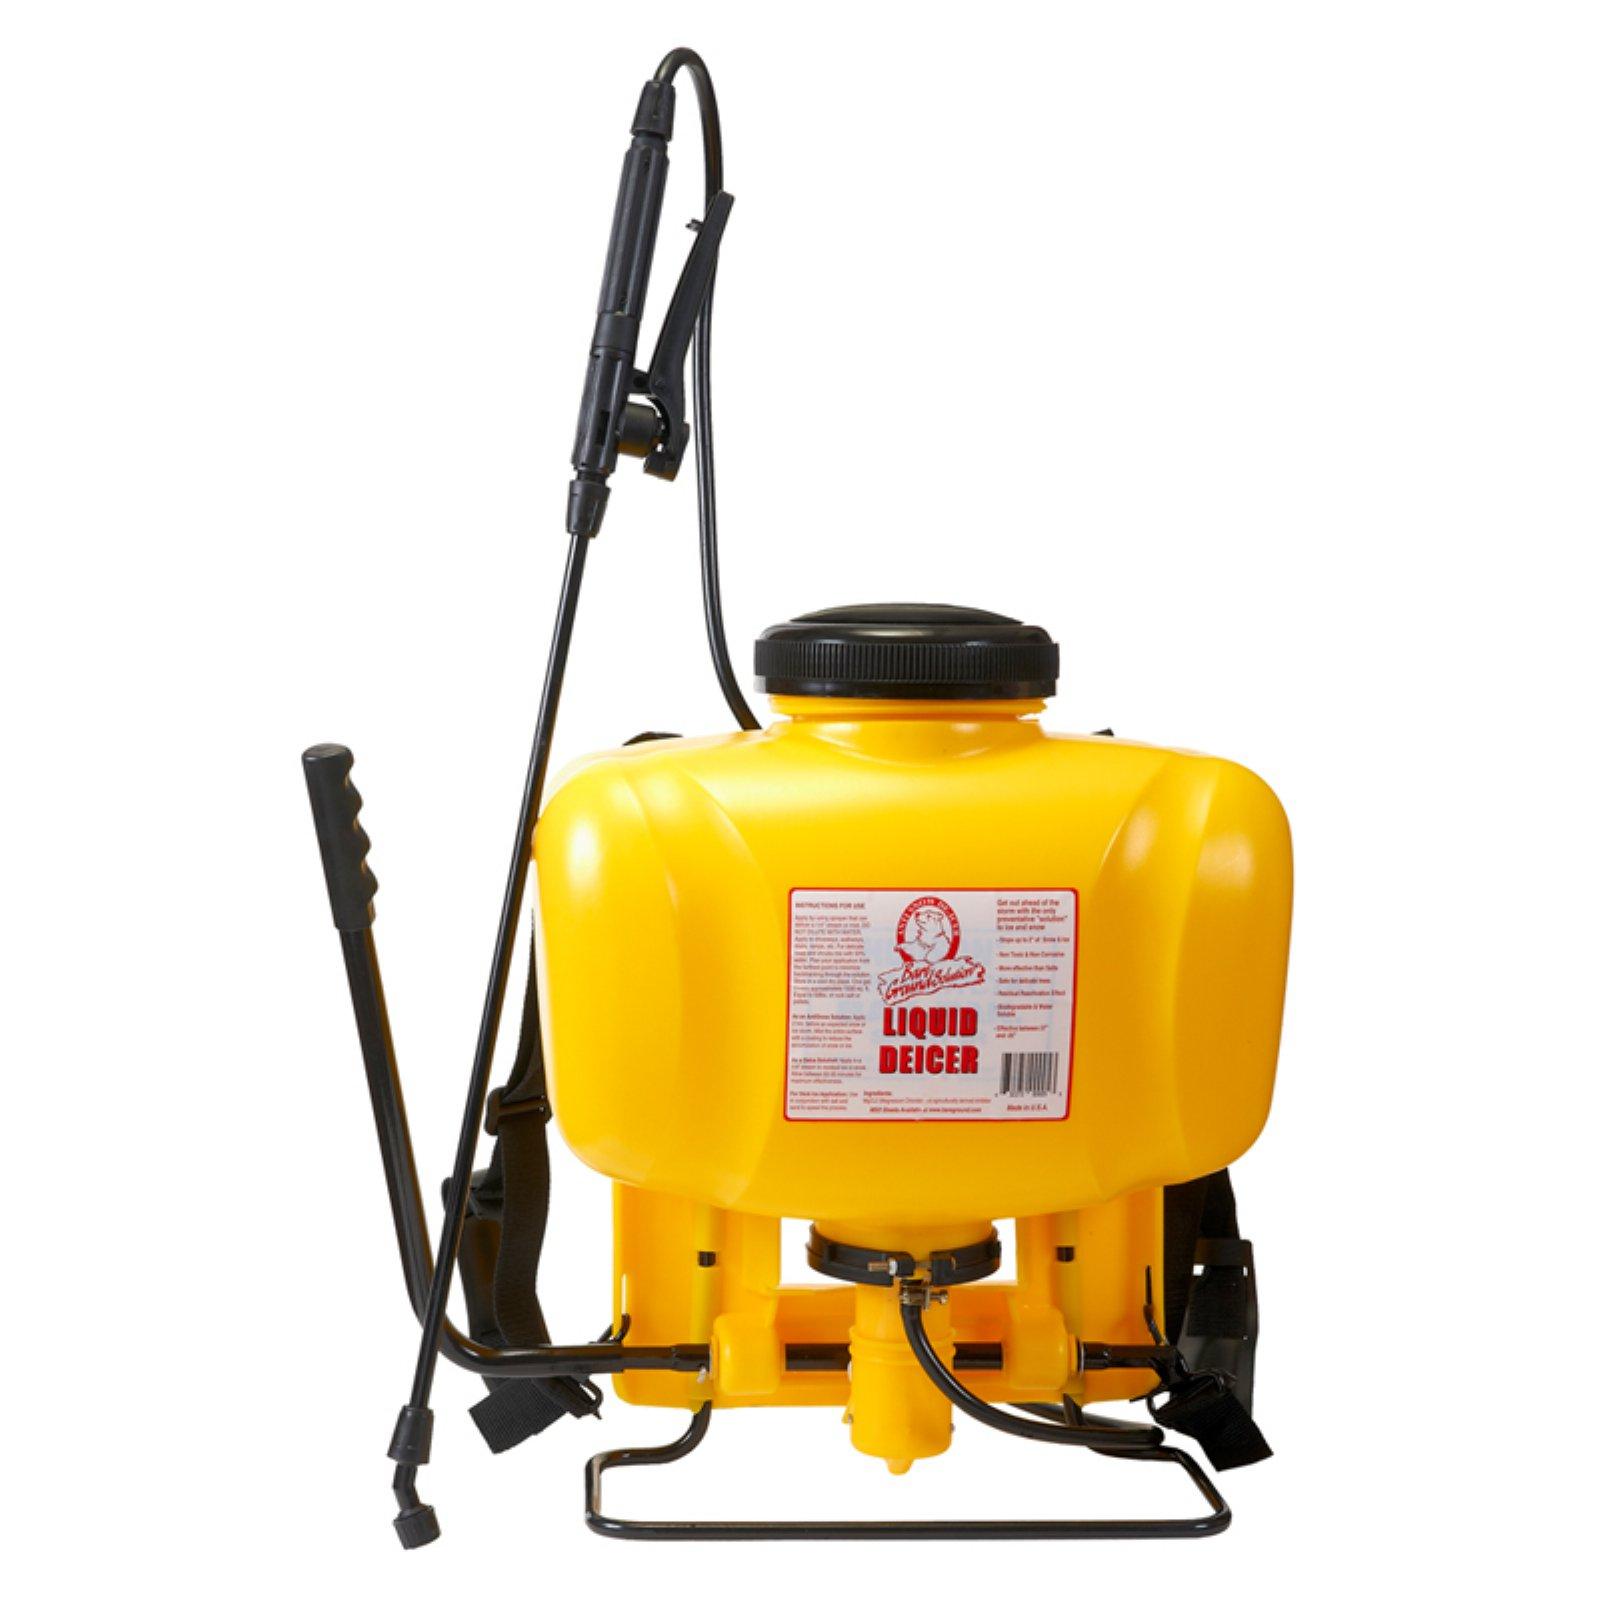 Bare Ground 4 gallon backpack sprayer (0063227242500) size 4 gallon capacity